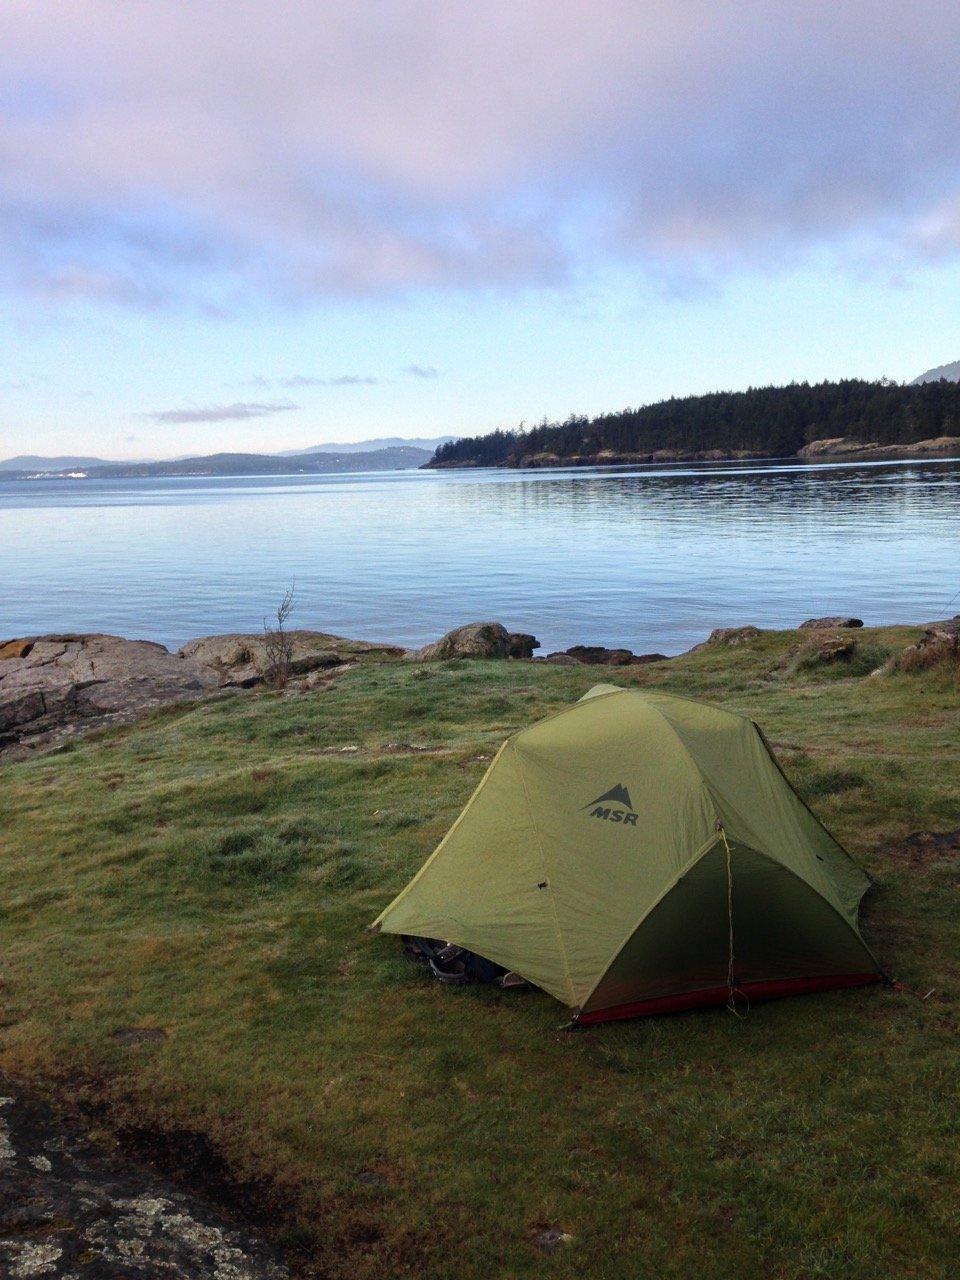 Camping at Ruckle Provincial Park on Salt Spring Island